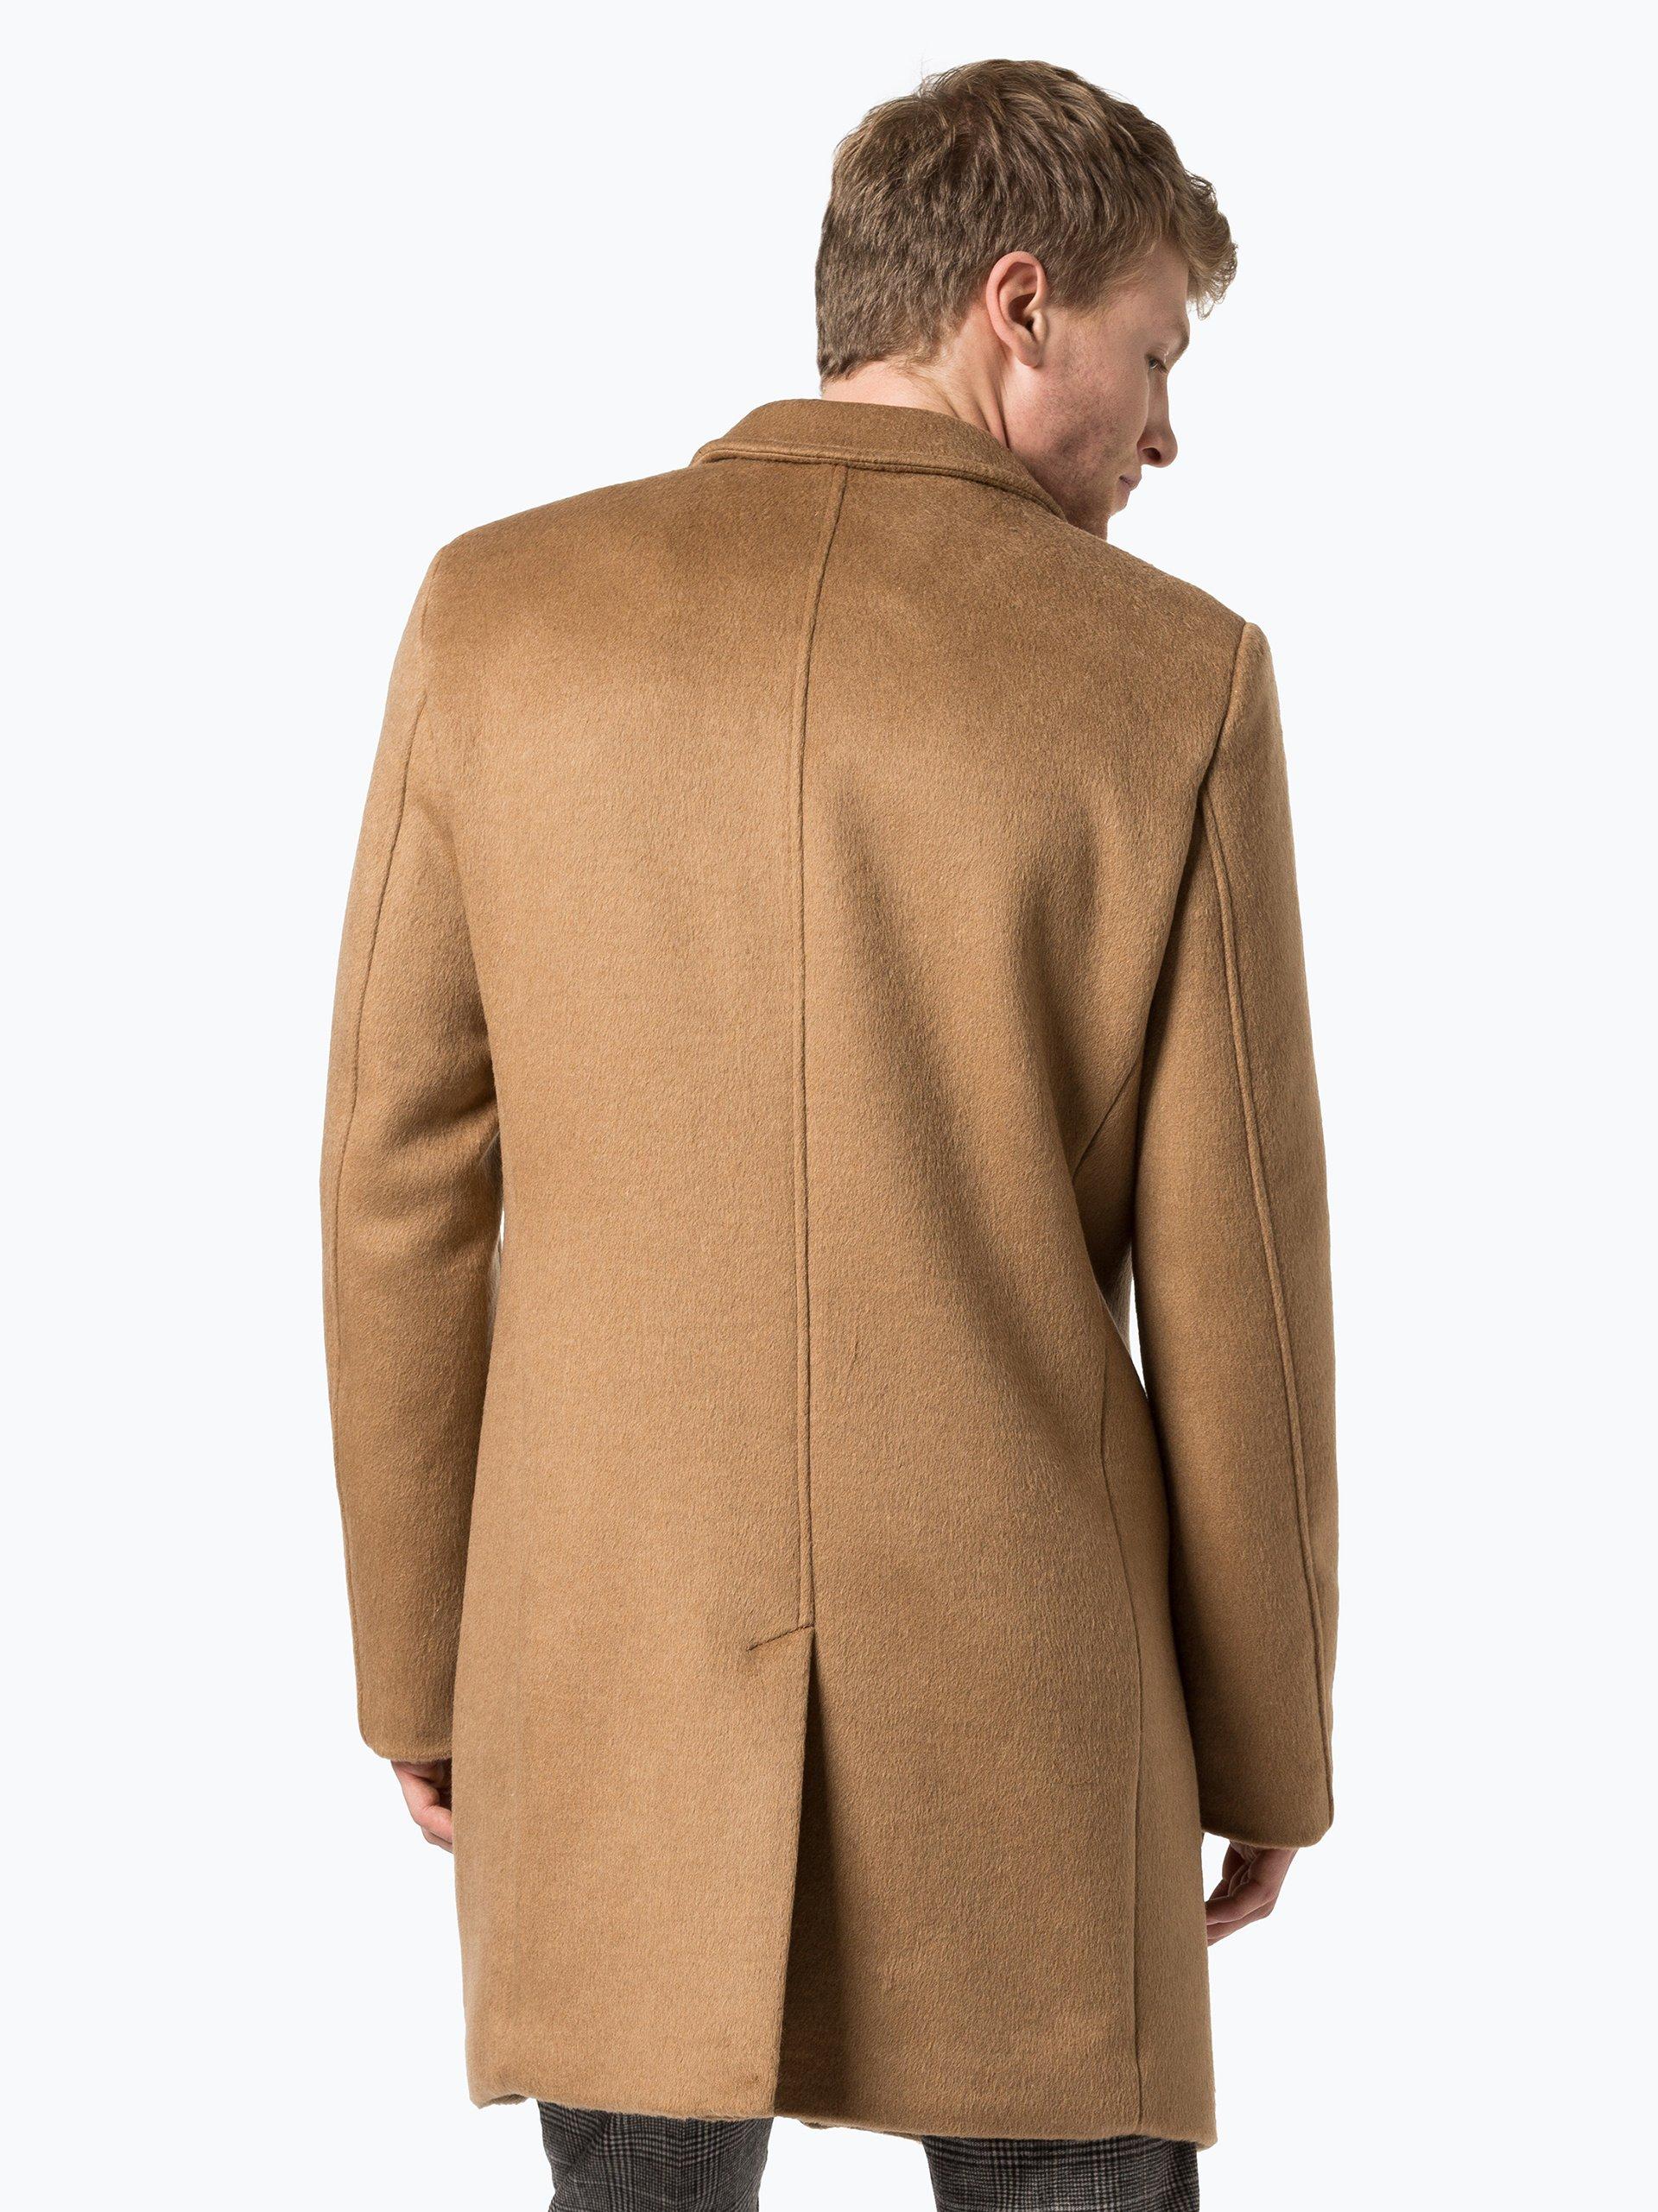 review herren mantel camel uni online kaufen peek und. Black Bedroom Furniture Sets. Home Design Ideas